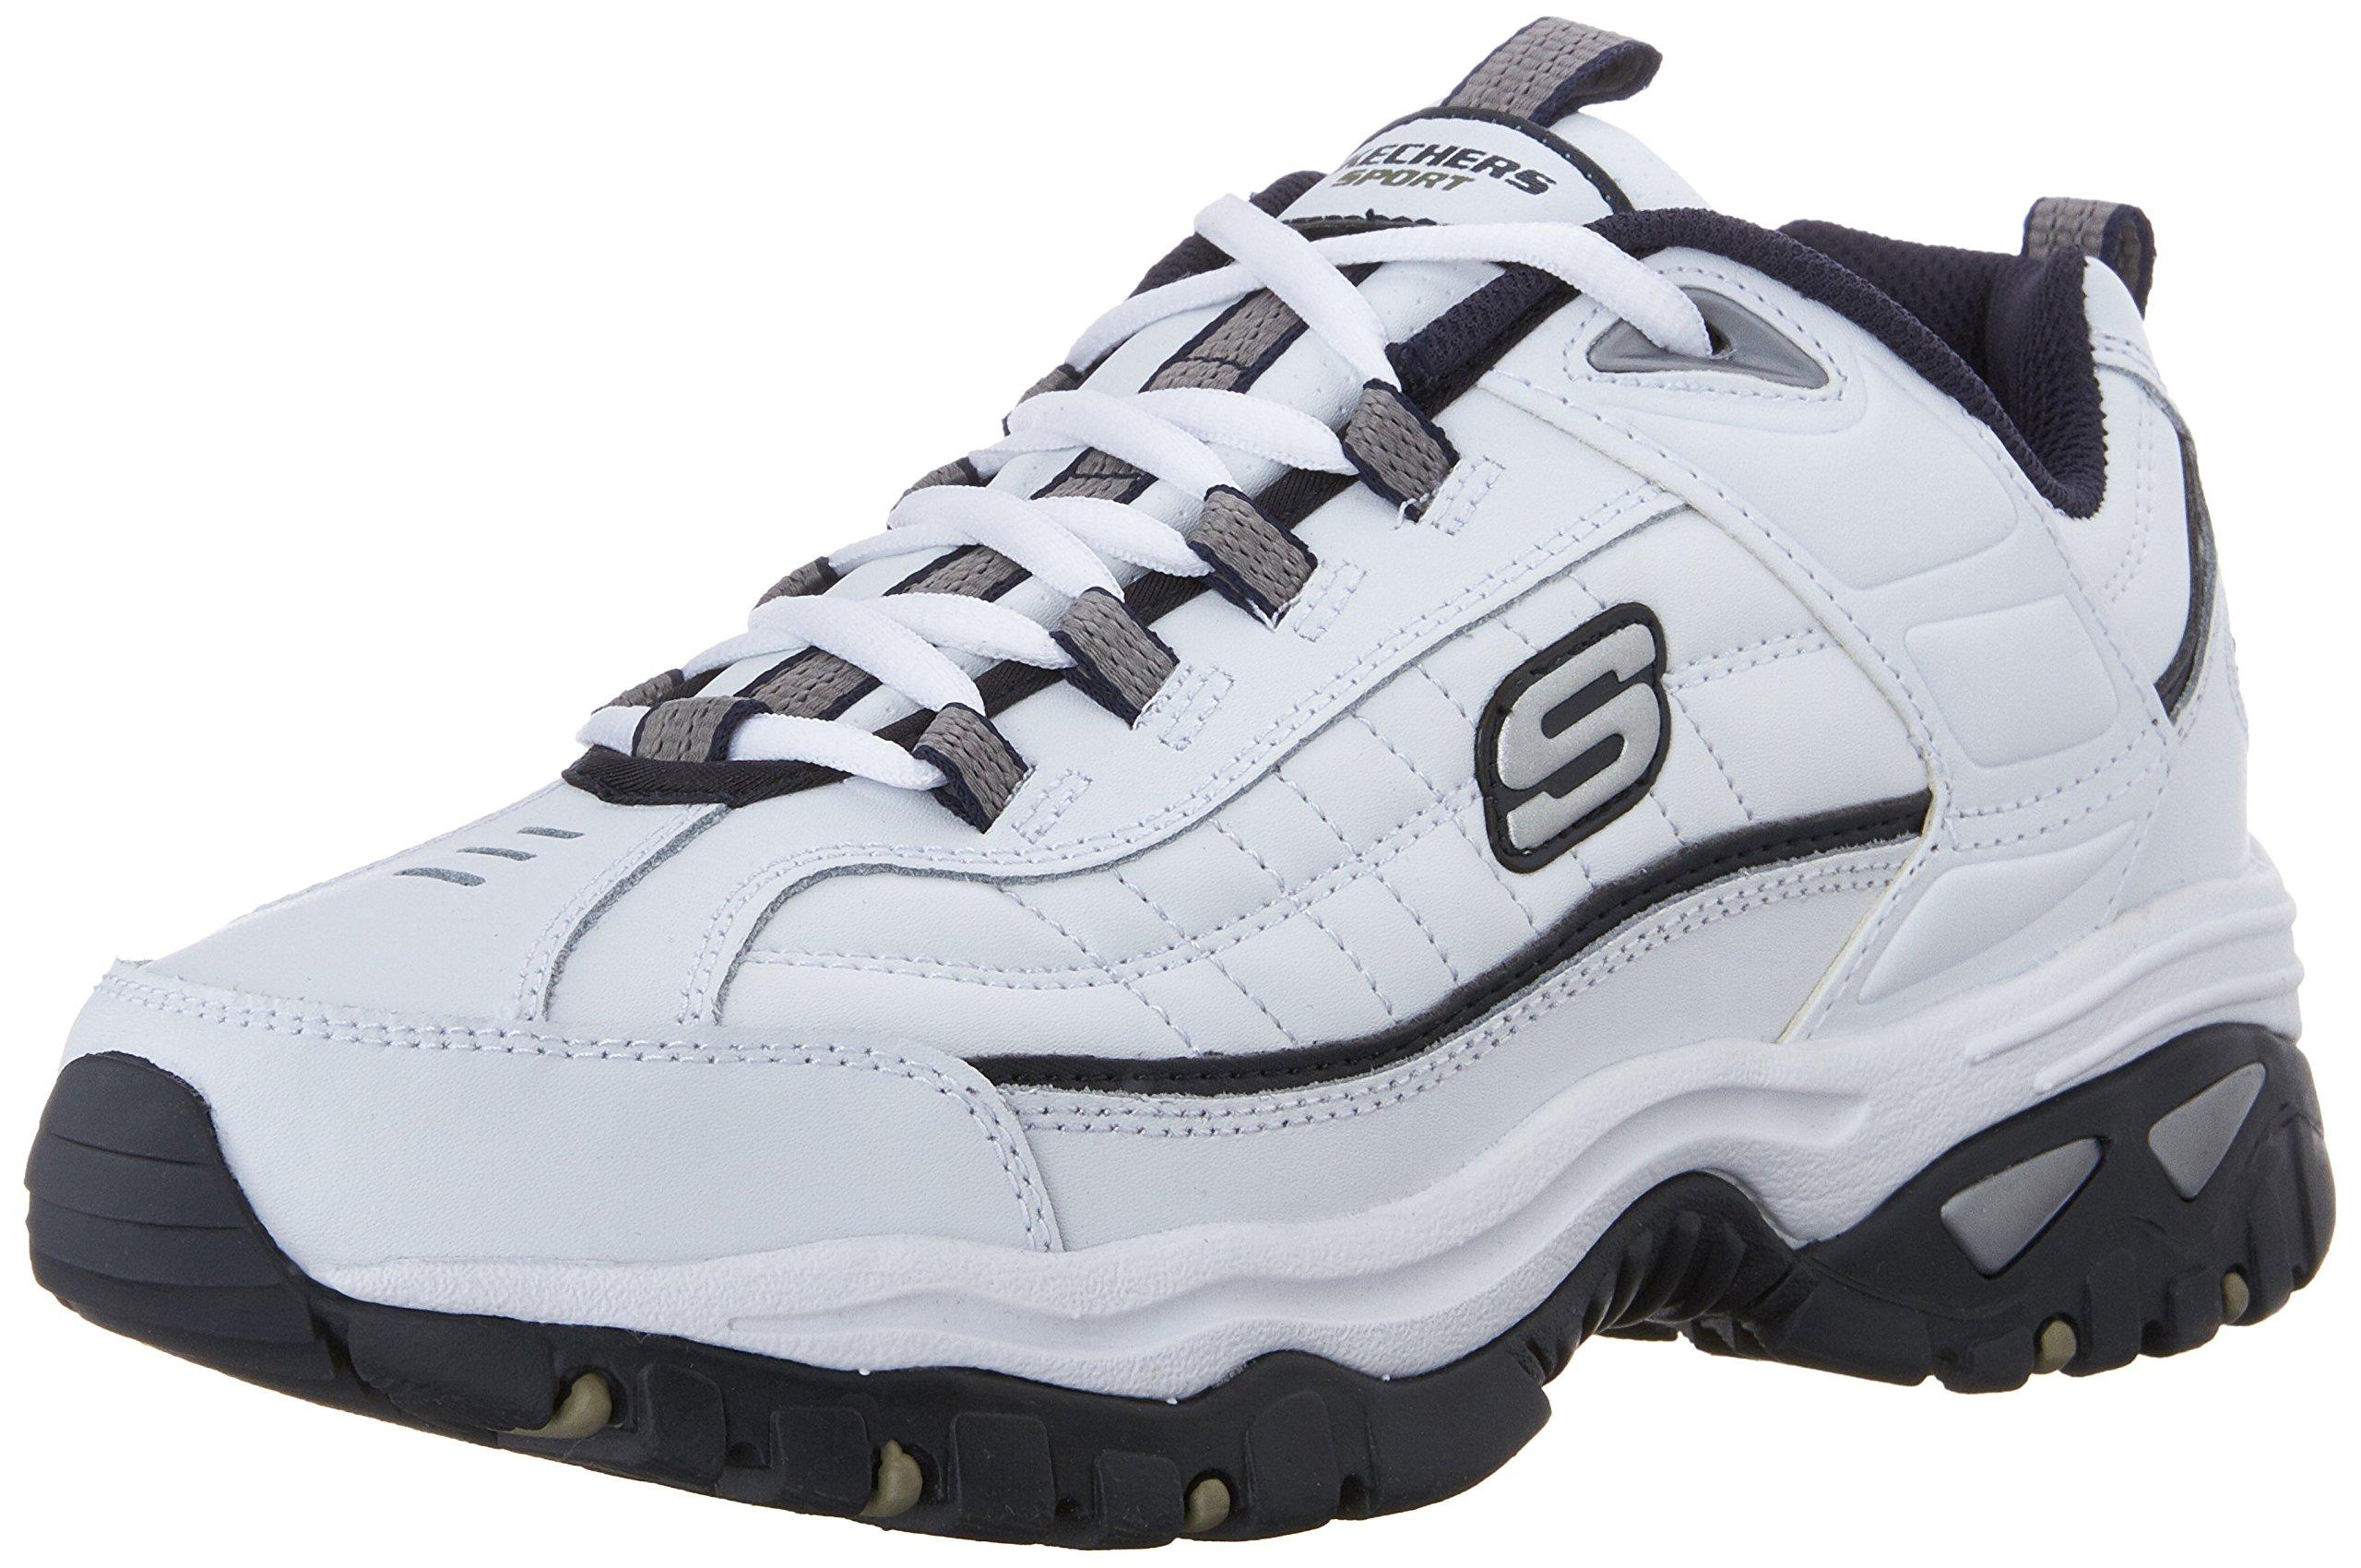 Skechers Men's Energy Afterburn Lace-Up Sneaker,White/Navy,14 M US by Skechers